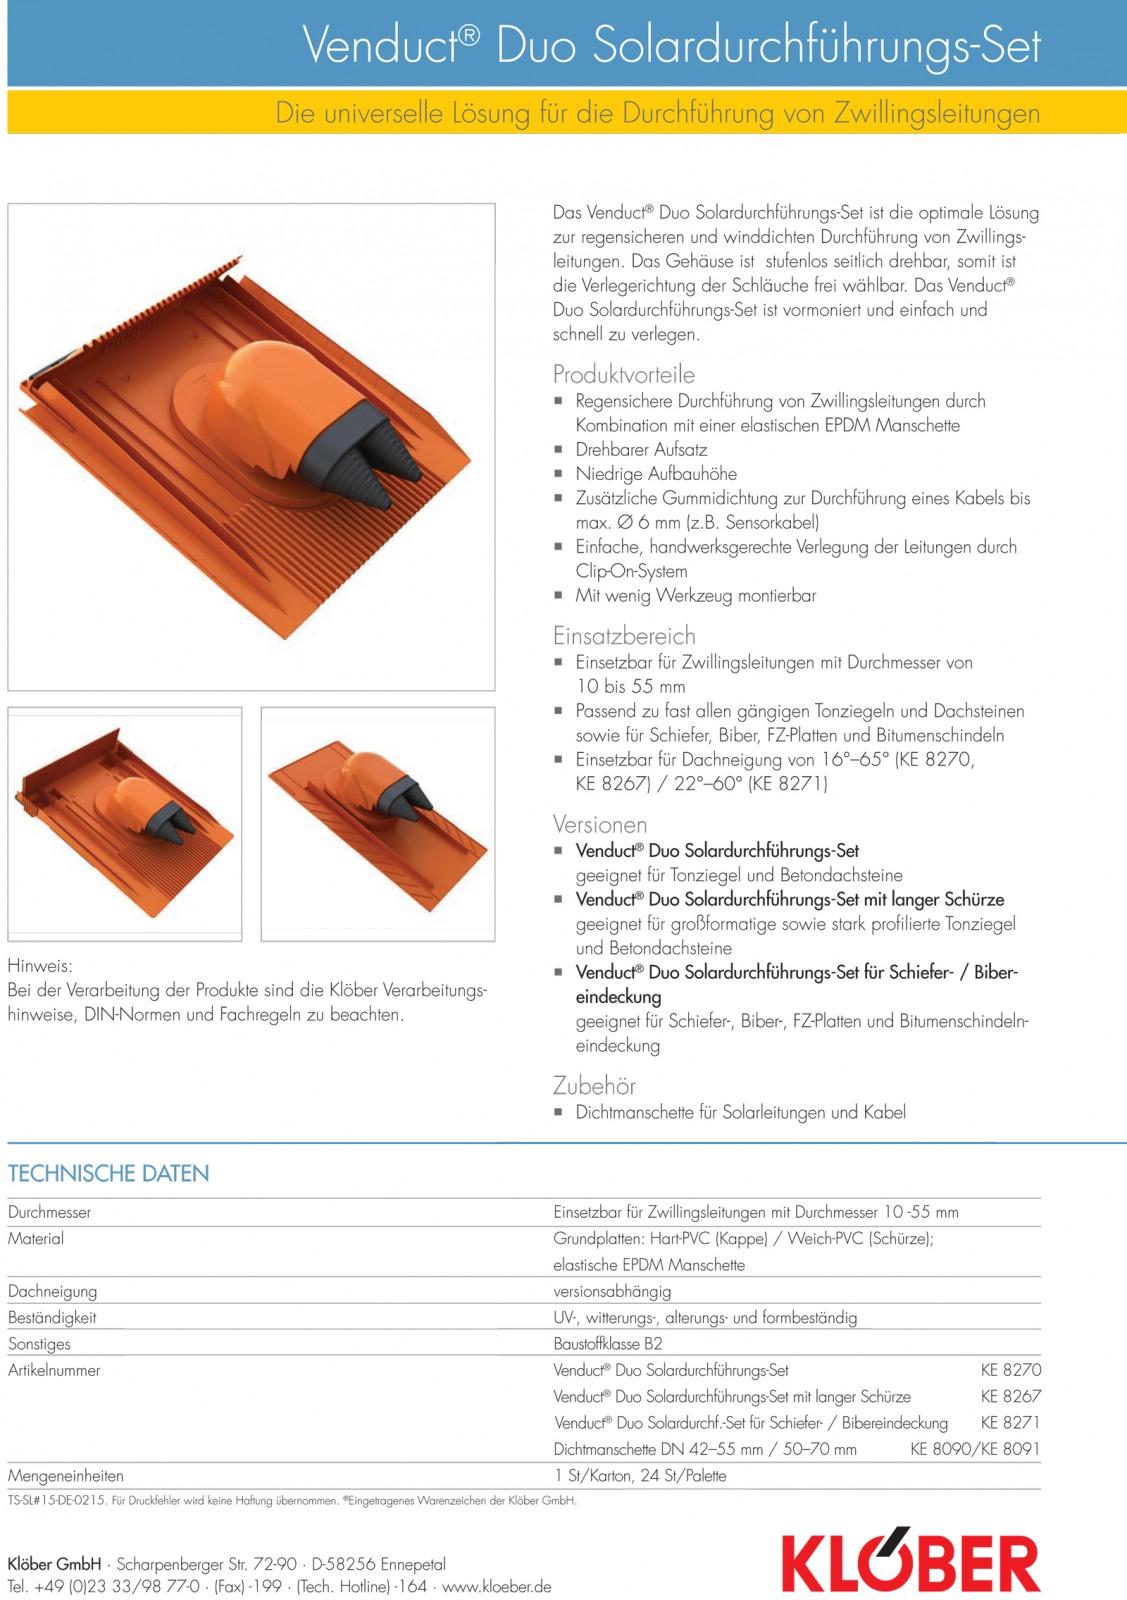 kl ber venduct duo solardurchf hrungs set rot dachdurchf hrung ke8270 0100 ebay. Black Bedroom Furniture Sets. Home Design Ideas